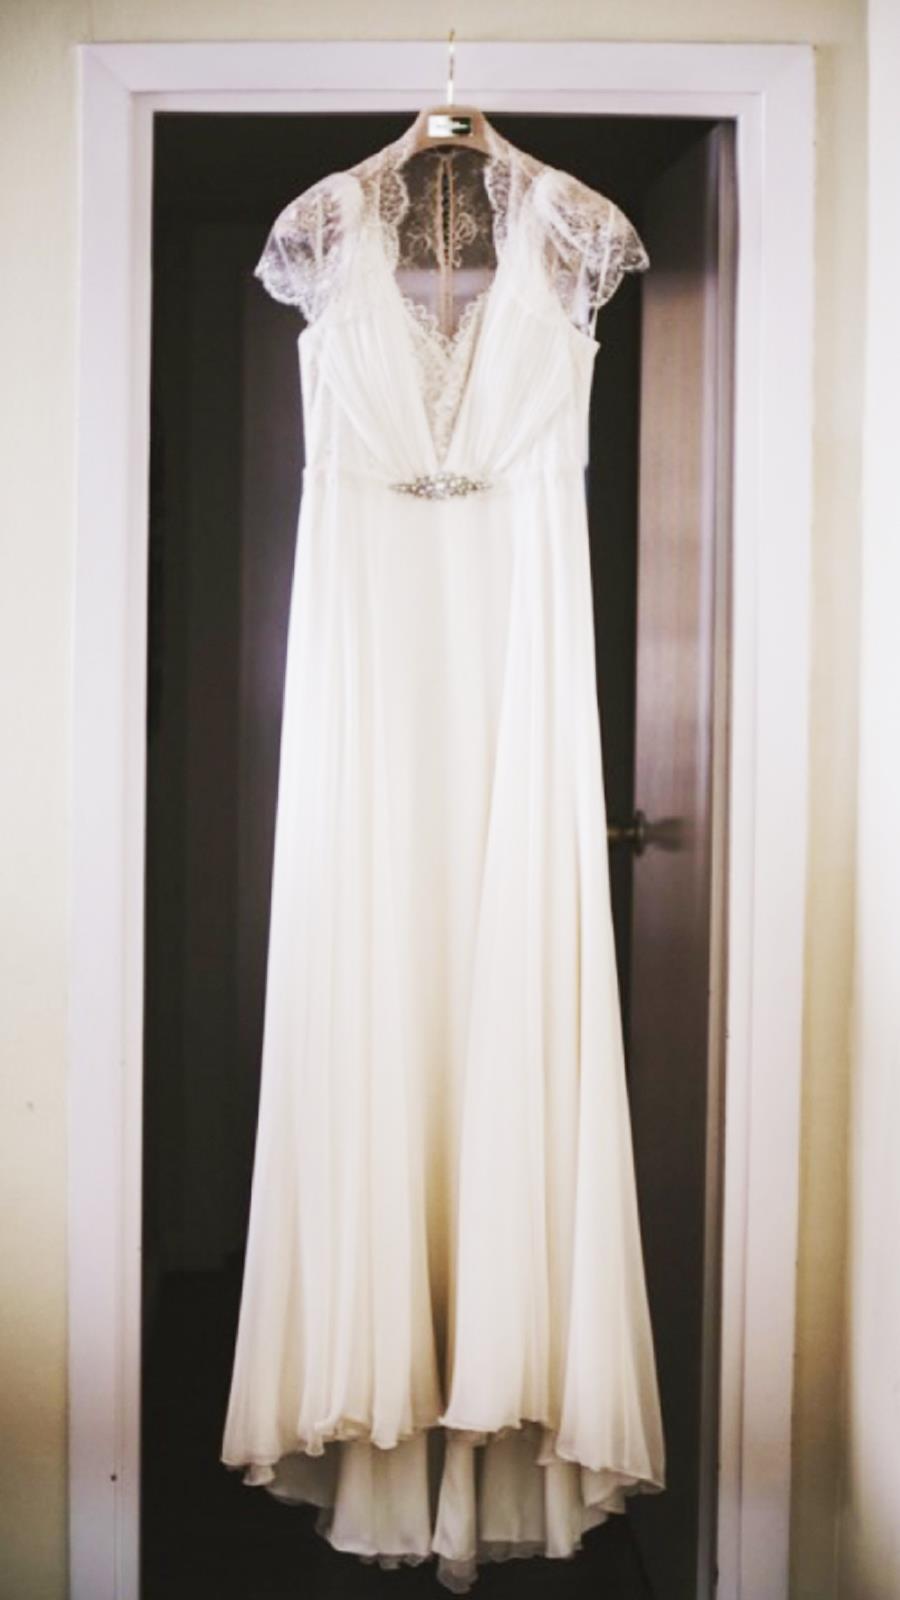 f1f7b4fd3 Vestido de novia de segunda mano de Jenny Packham visto en Nuptialista por  1.000 euros.